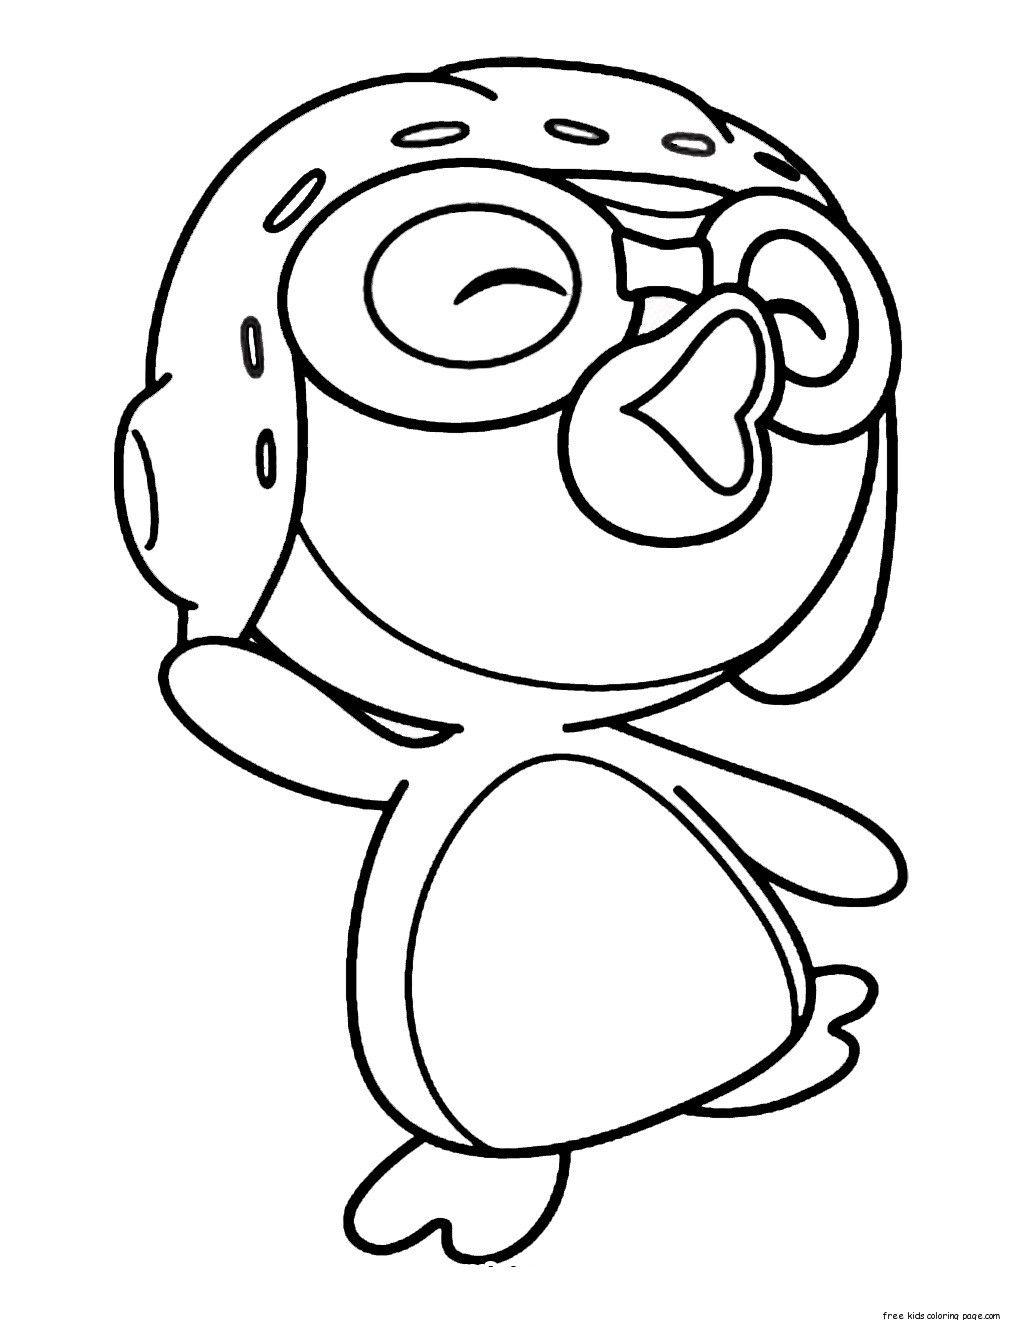 Printable coloring pages ultraman - Desenhos De Pororo O Pequeno Pinguim Para Colorir Pintar Imprimir Moldes E Riscos Coloring Pages For Kidsprintable